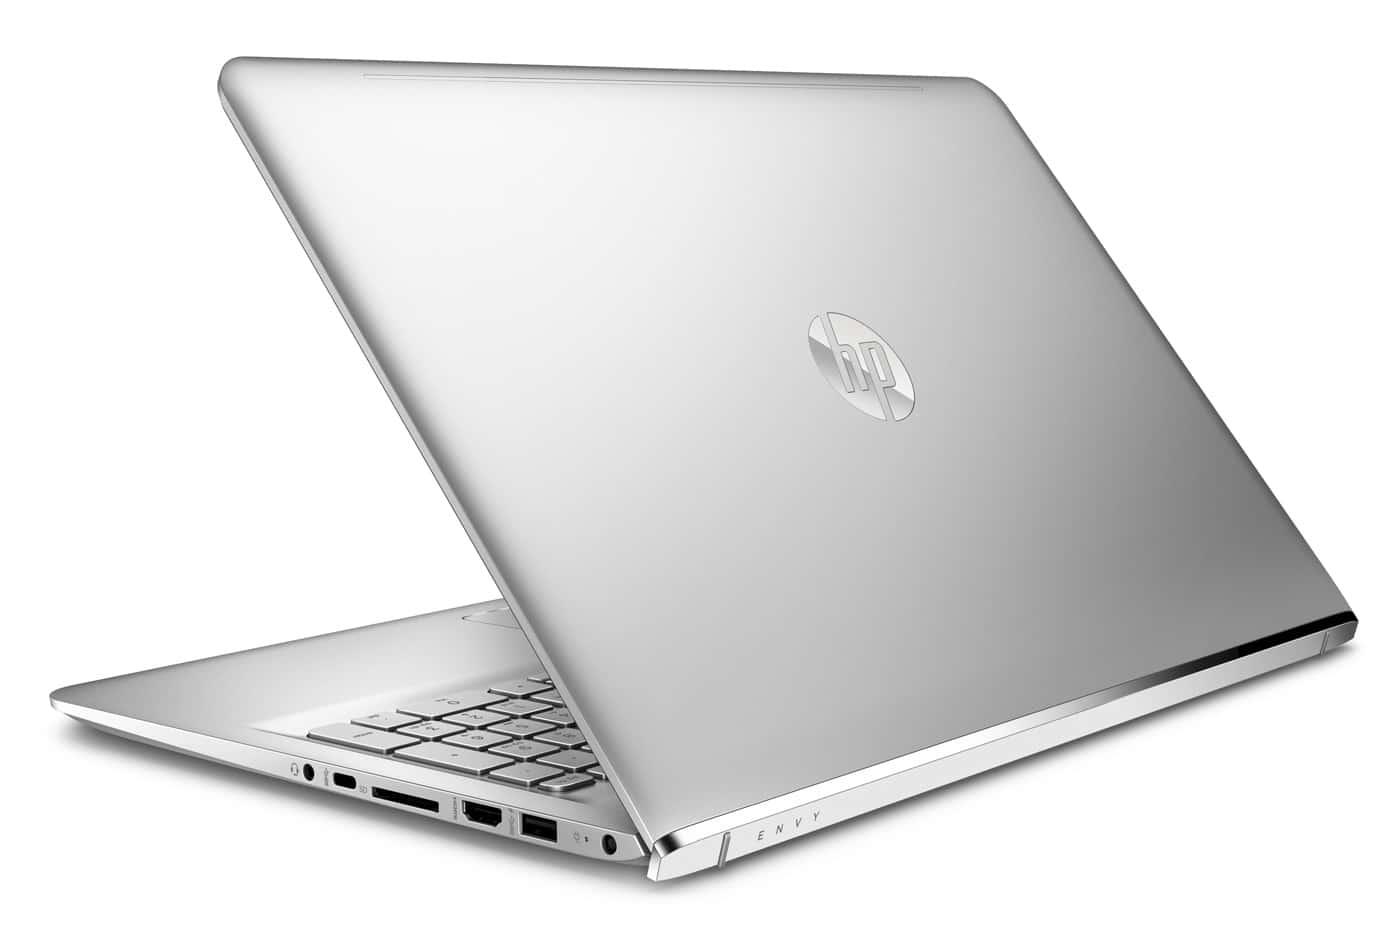 HP Envy 15-as117nf, Ultrabook 15 pouces IPS SSD Kaby Lake Iris promo 1099€